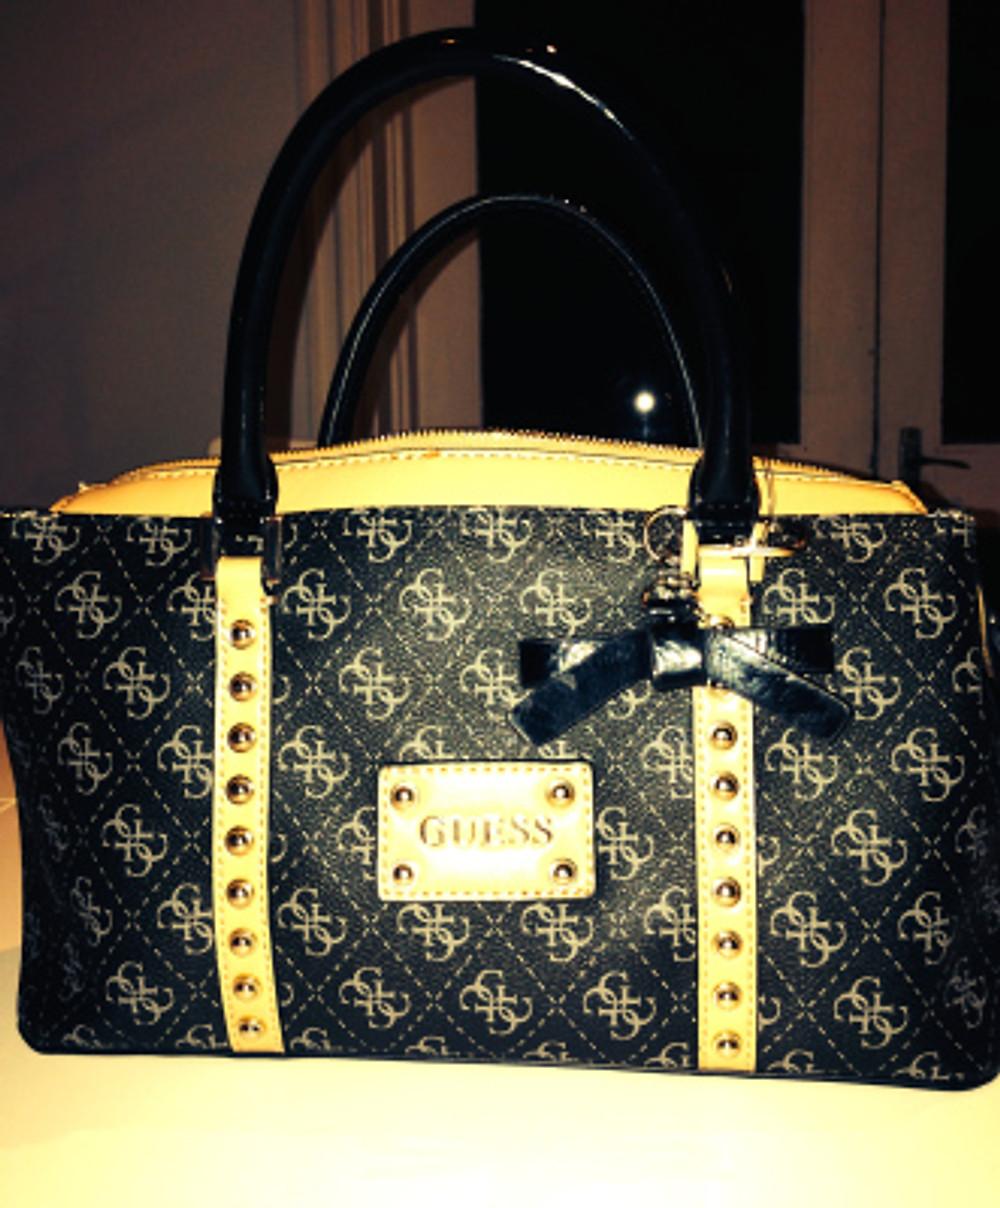 Women and Handbags: A Love Story